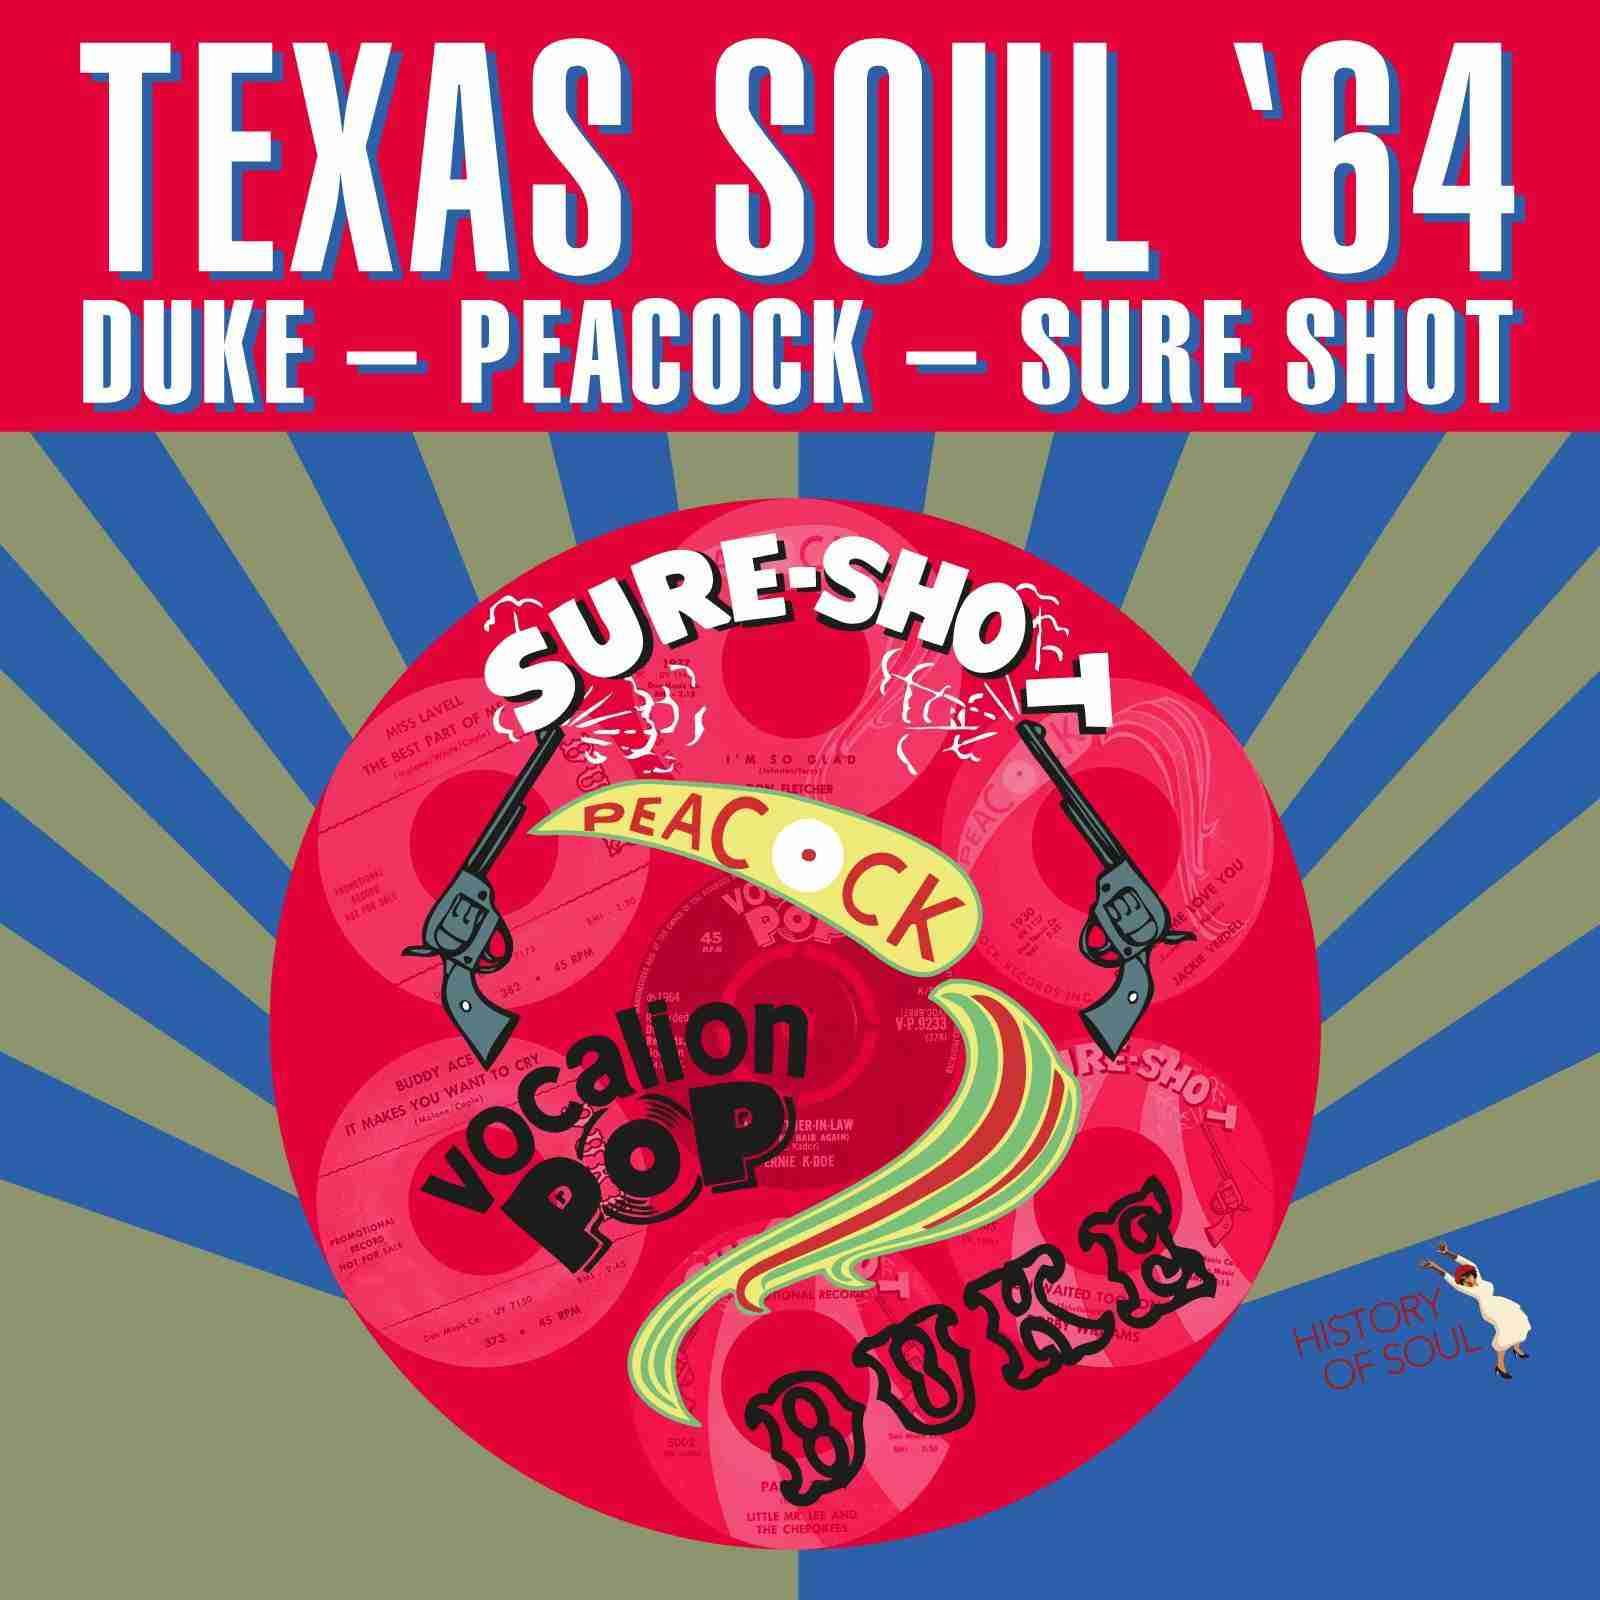 Texas Soul '64